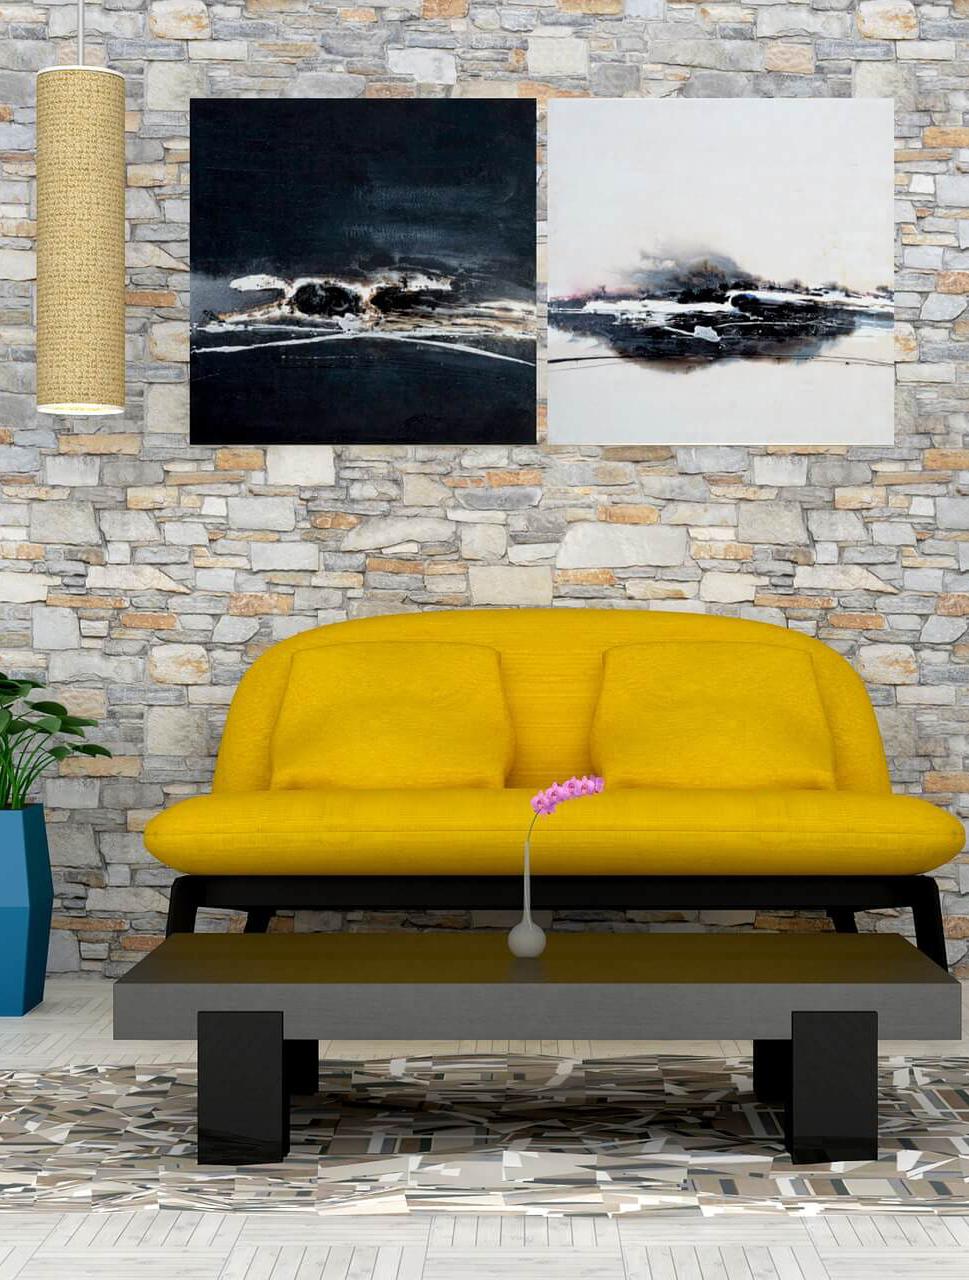 Современный дизайн квартир, Dofamine